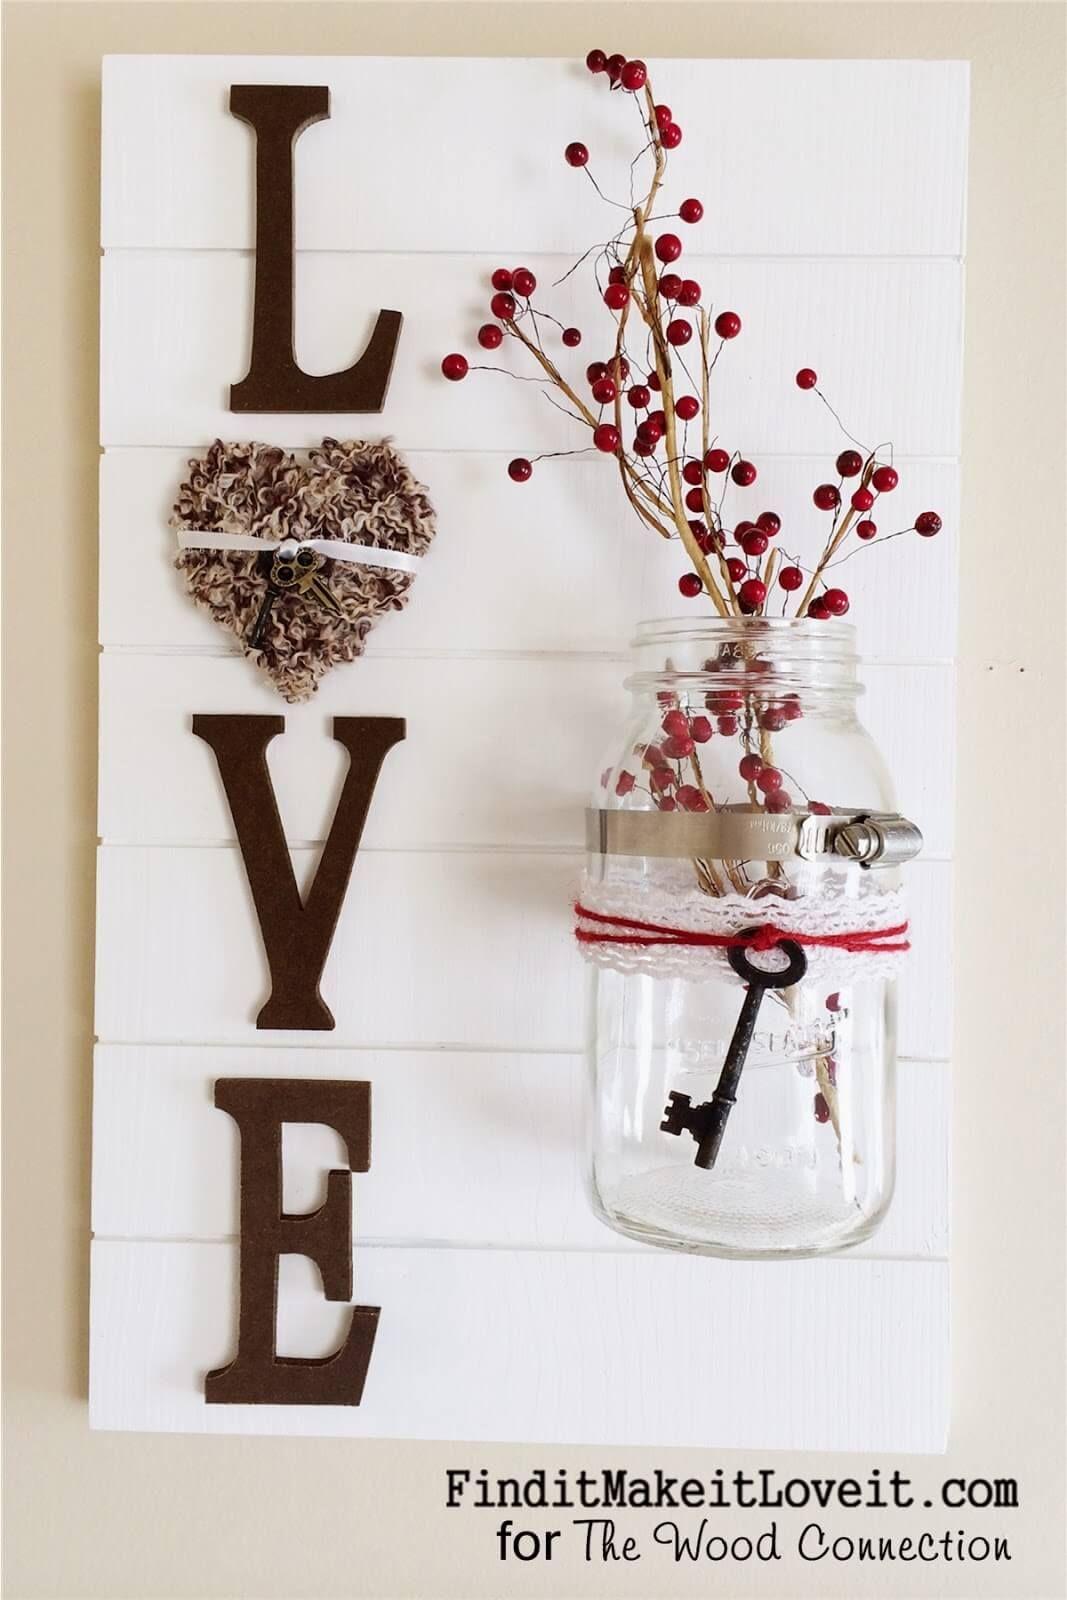 enchanting mason jar wall decor ideas to brighten your walls